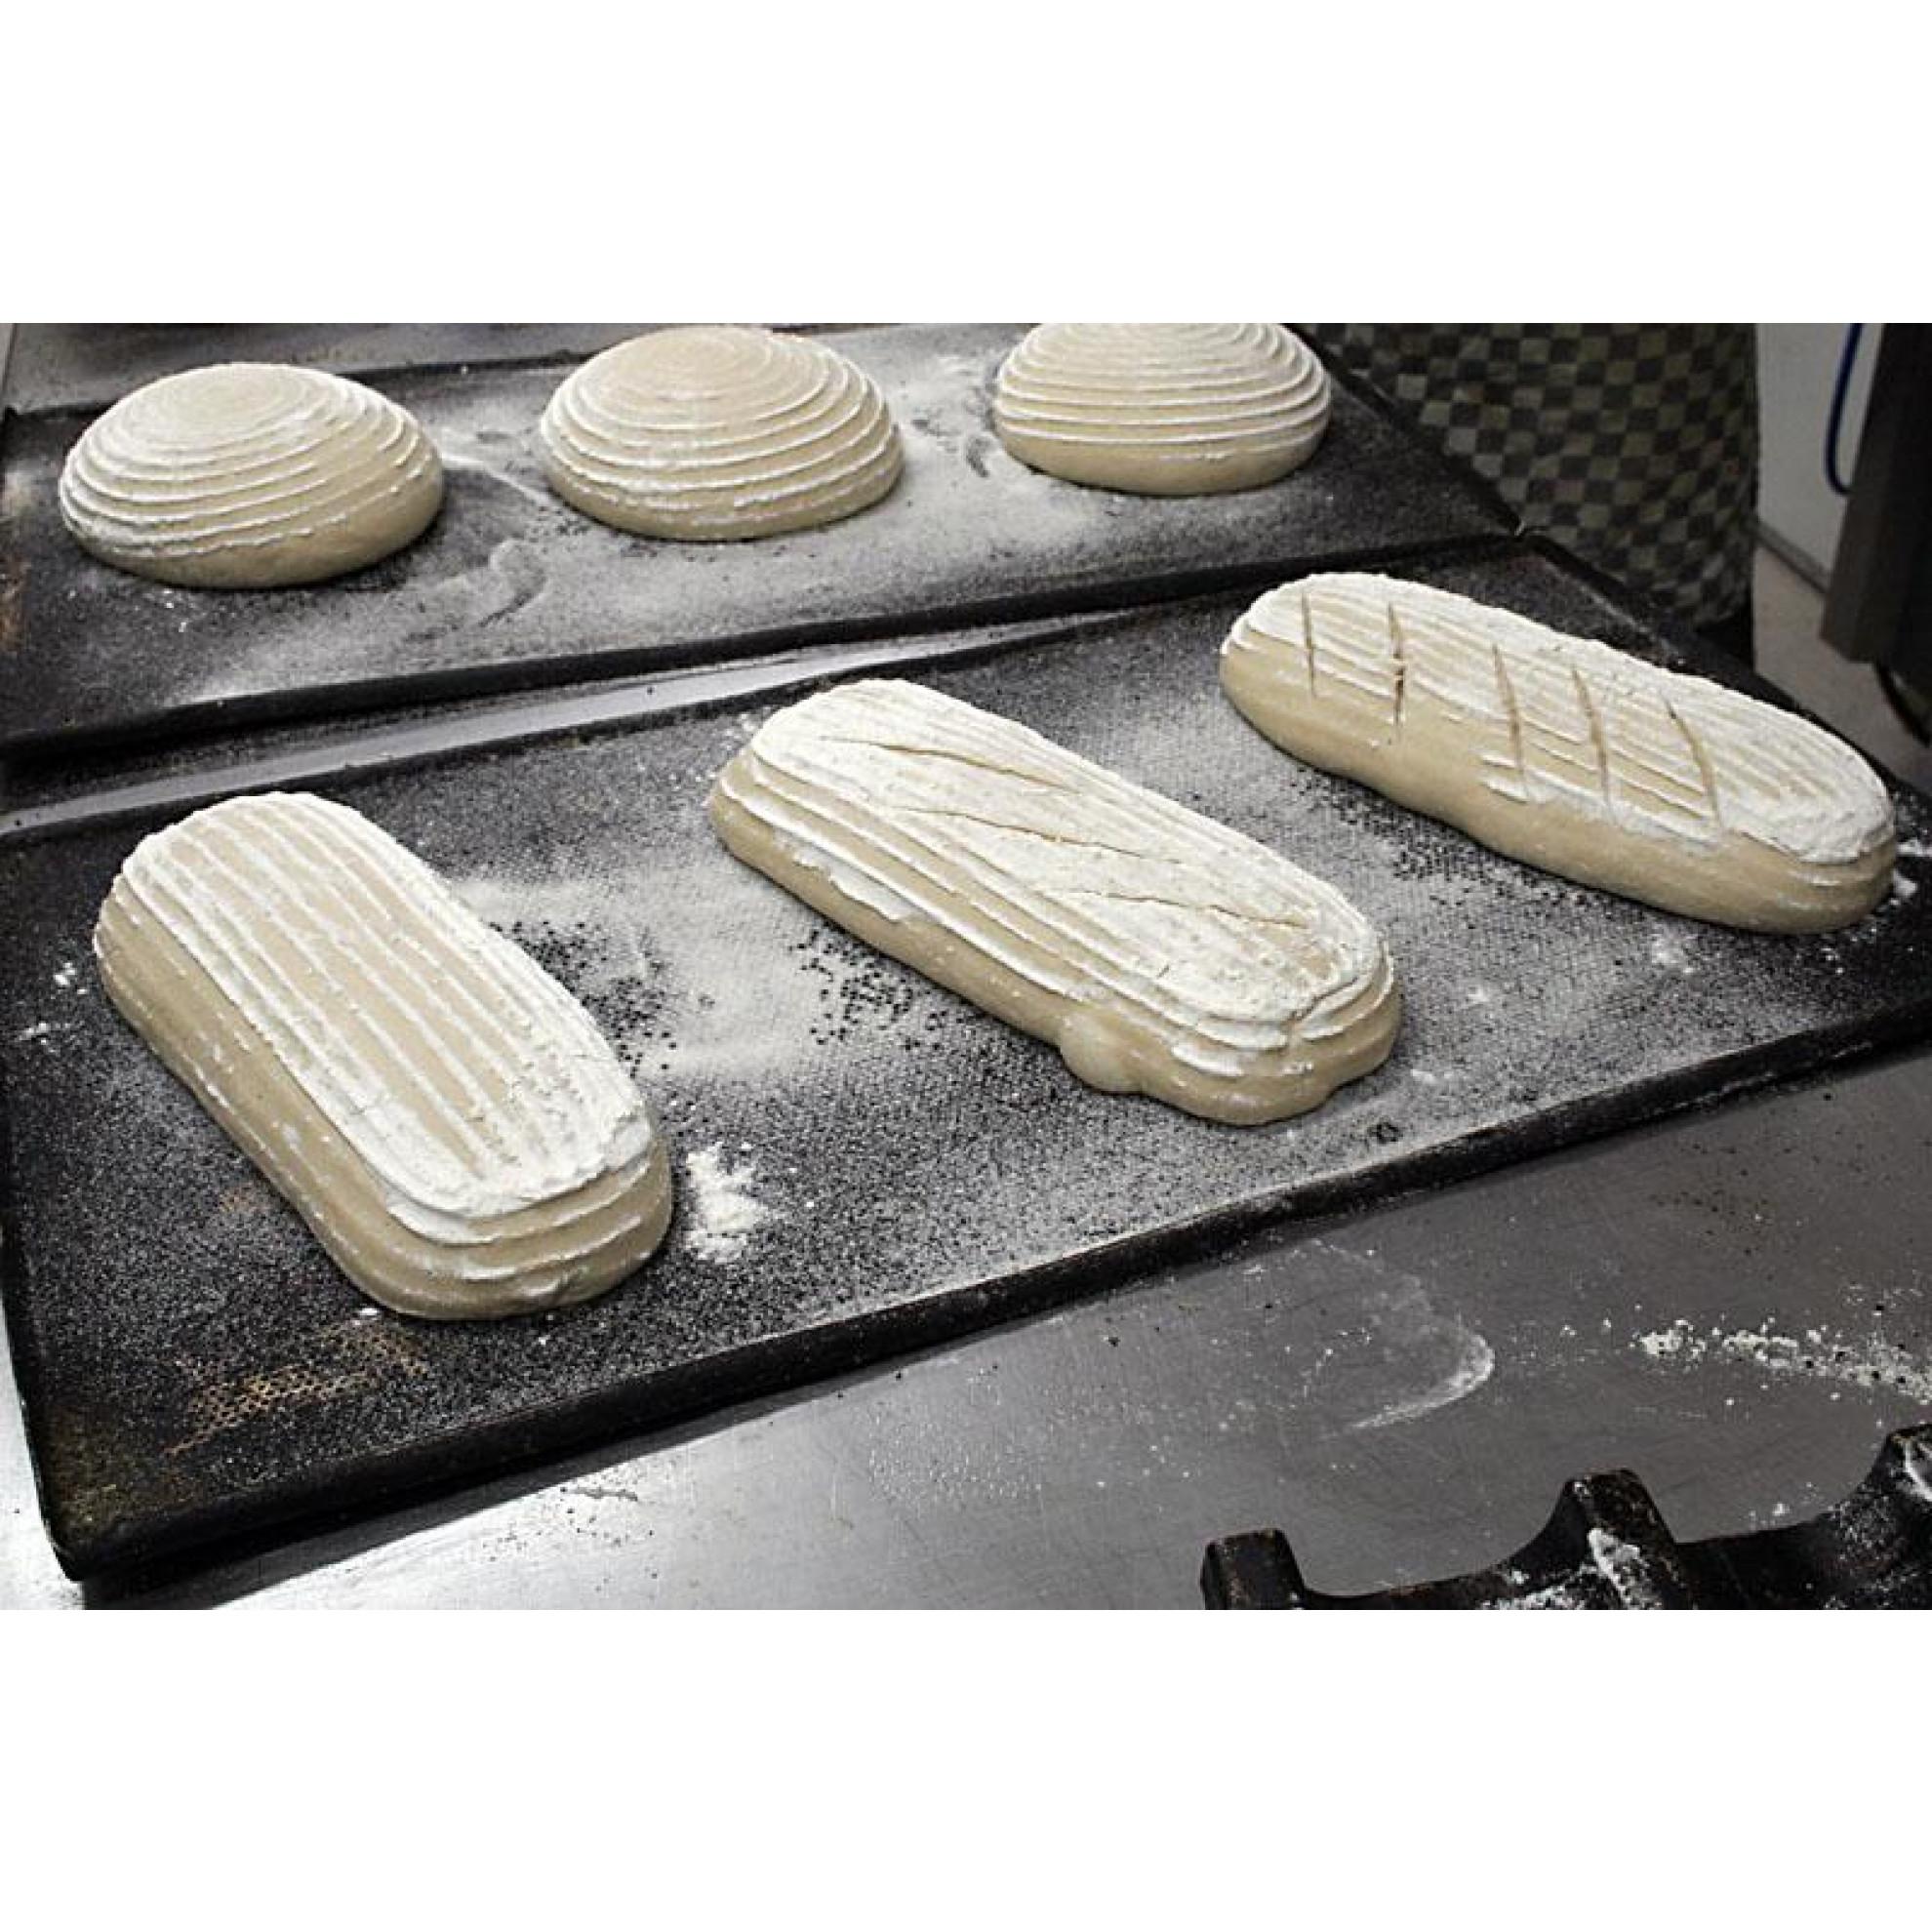 Banneton Bread Dough Proofing Basket Oval For 2 2lb 1kg